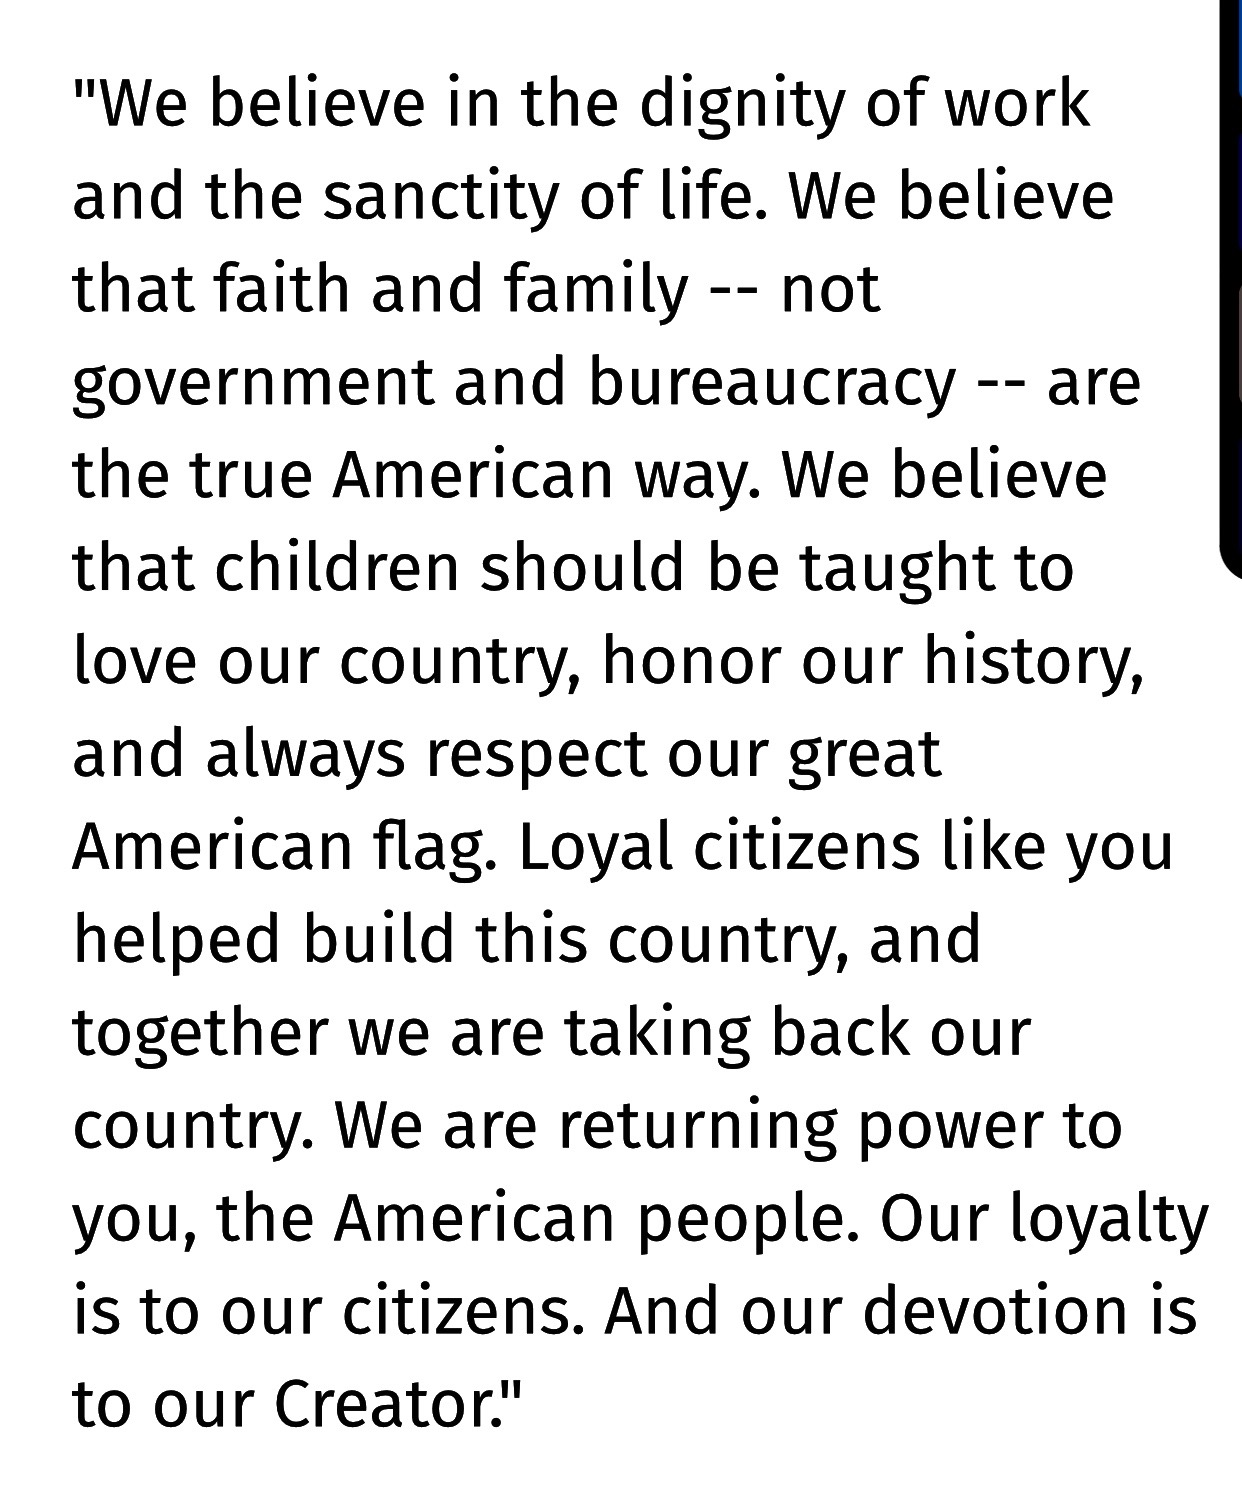 Speech of Donald Trump, Oct. 17, 2019